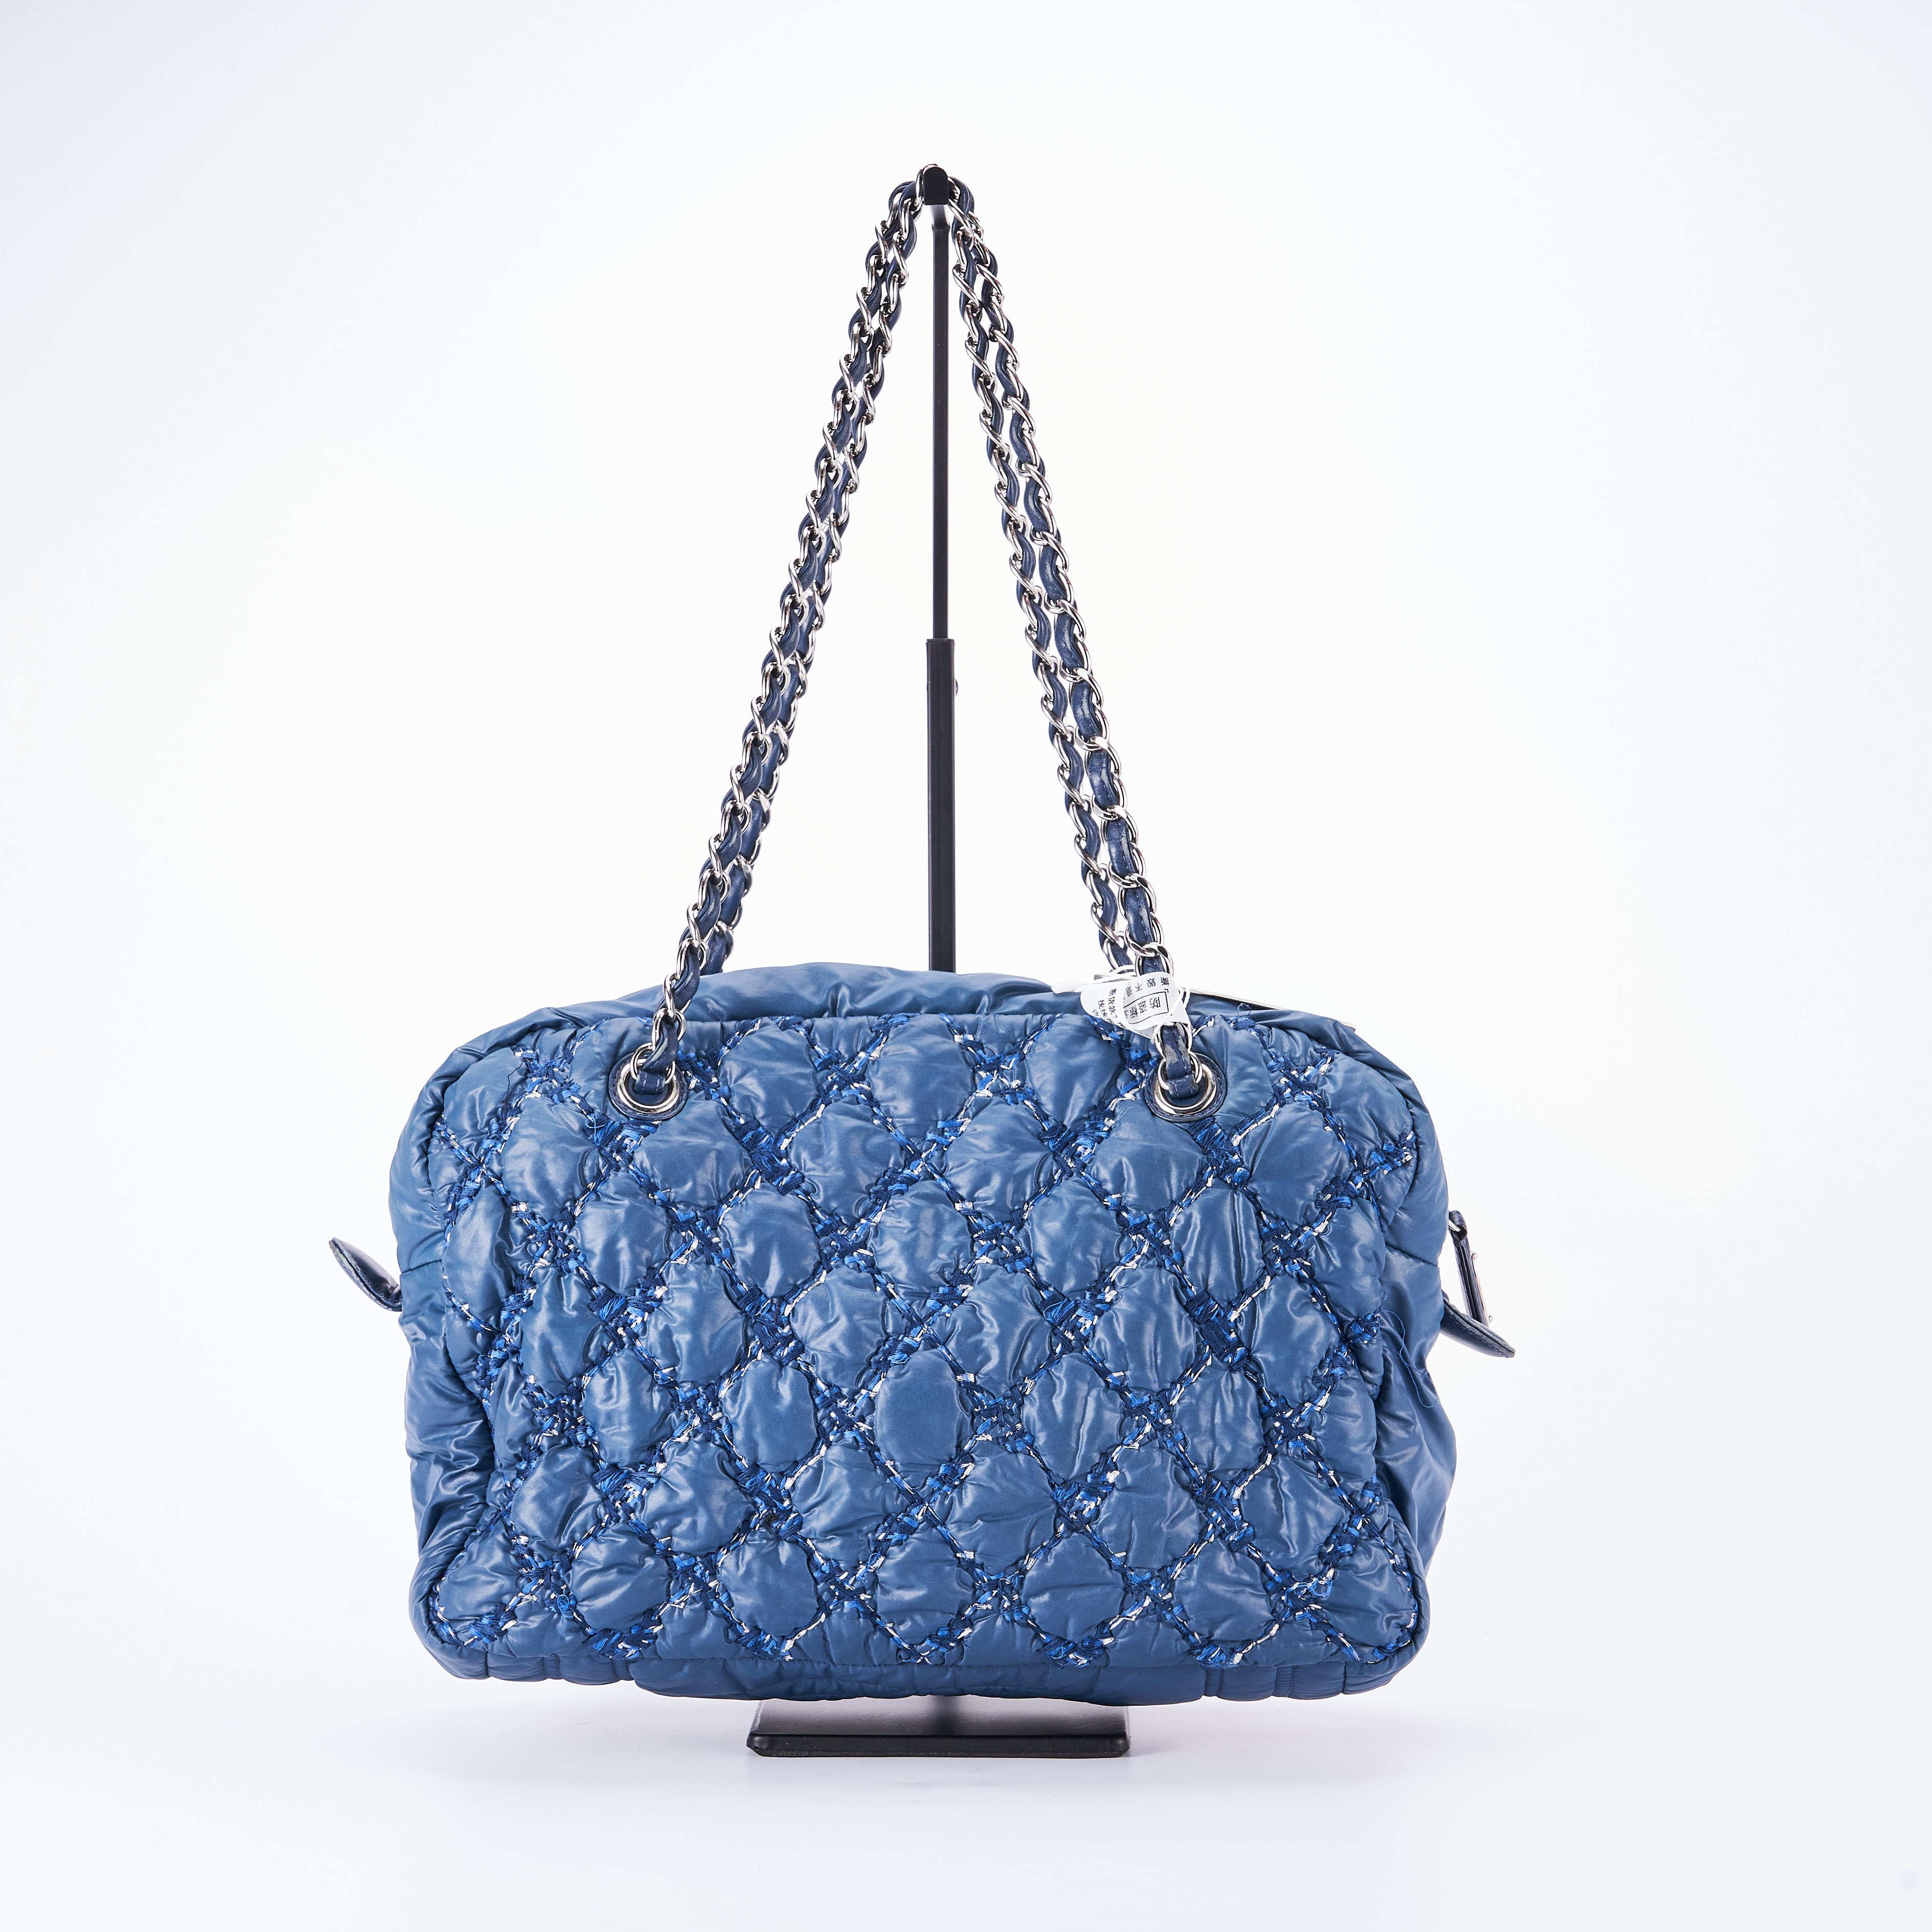 chanel链条包 【95新】Chanel香奈儿 链条单肩包 32*22 公价¥15800_推荐淘宝好看的chanel链条包